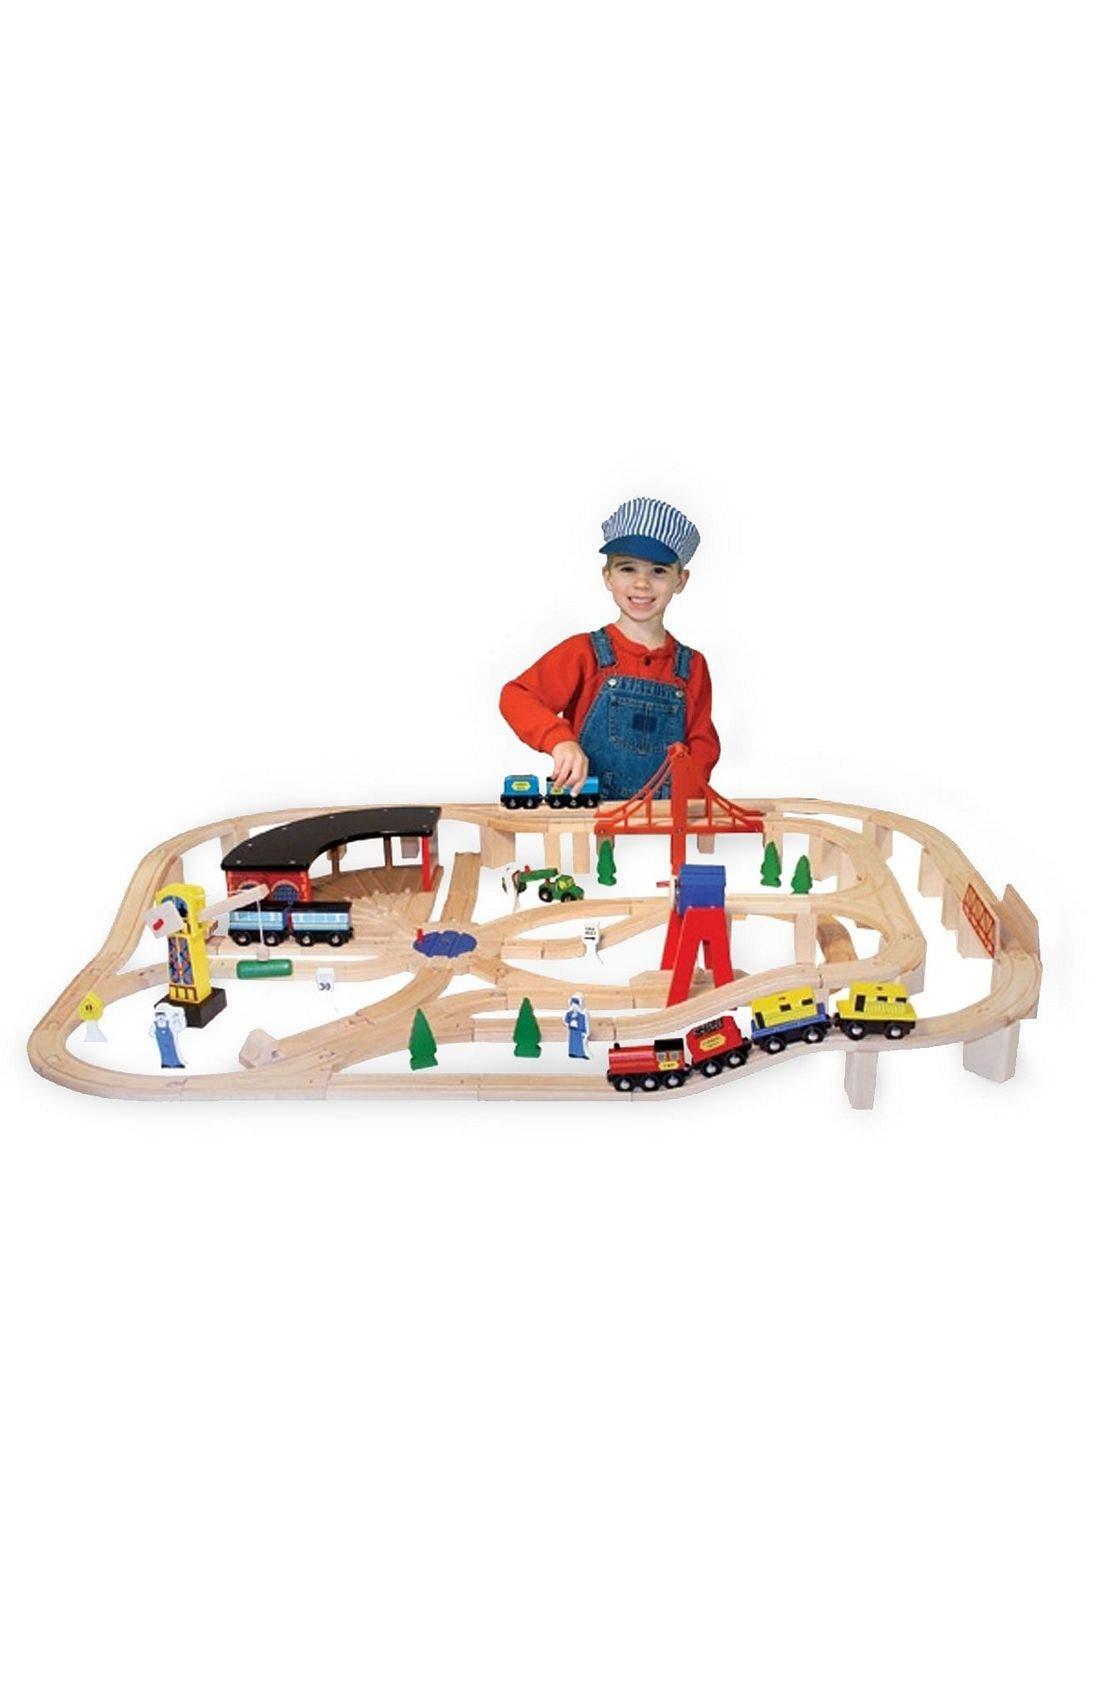 Melissa & Doug 132-Piece Wooden Railway Set